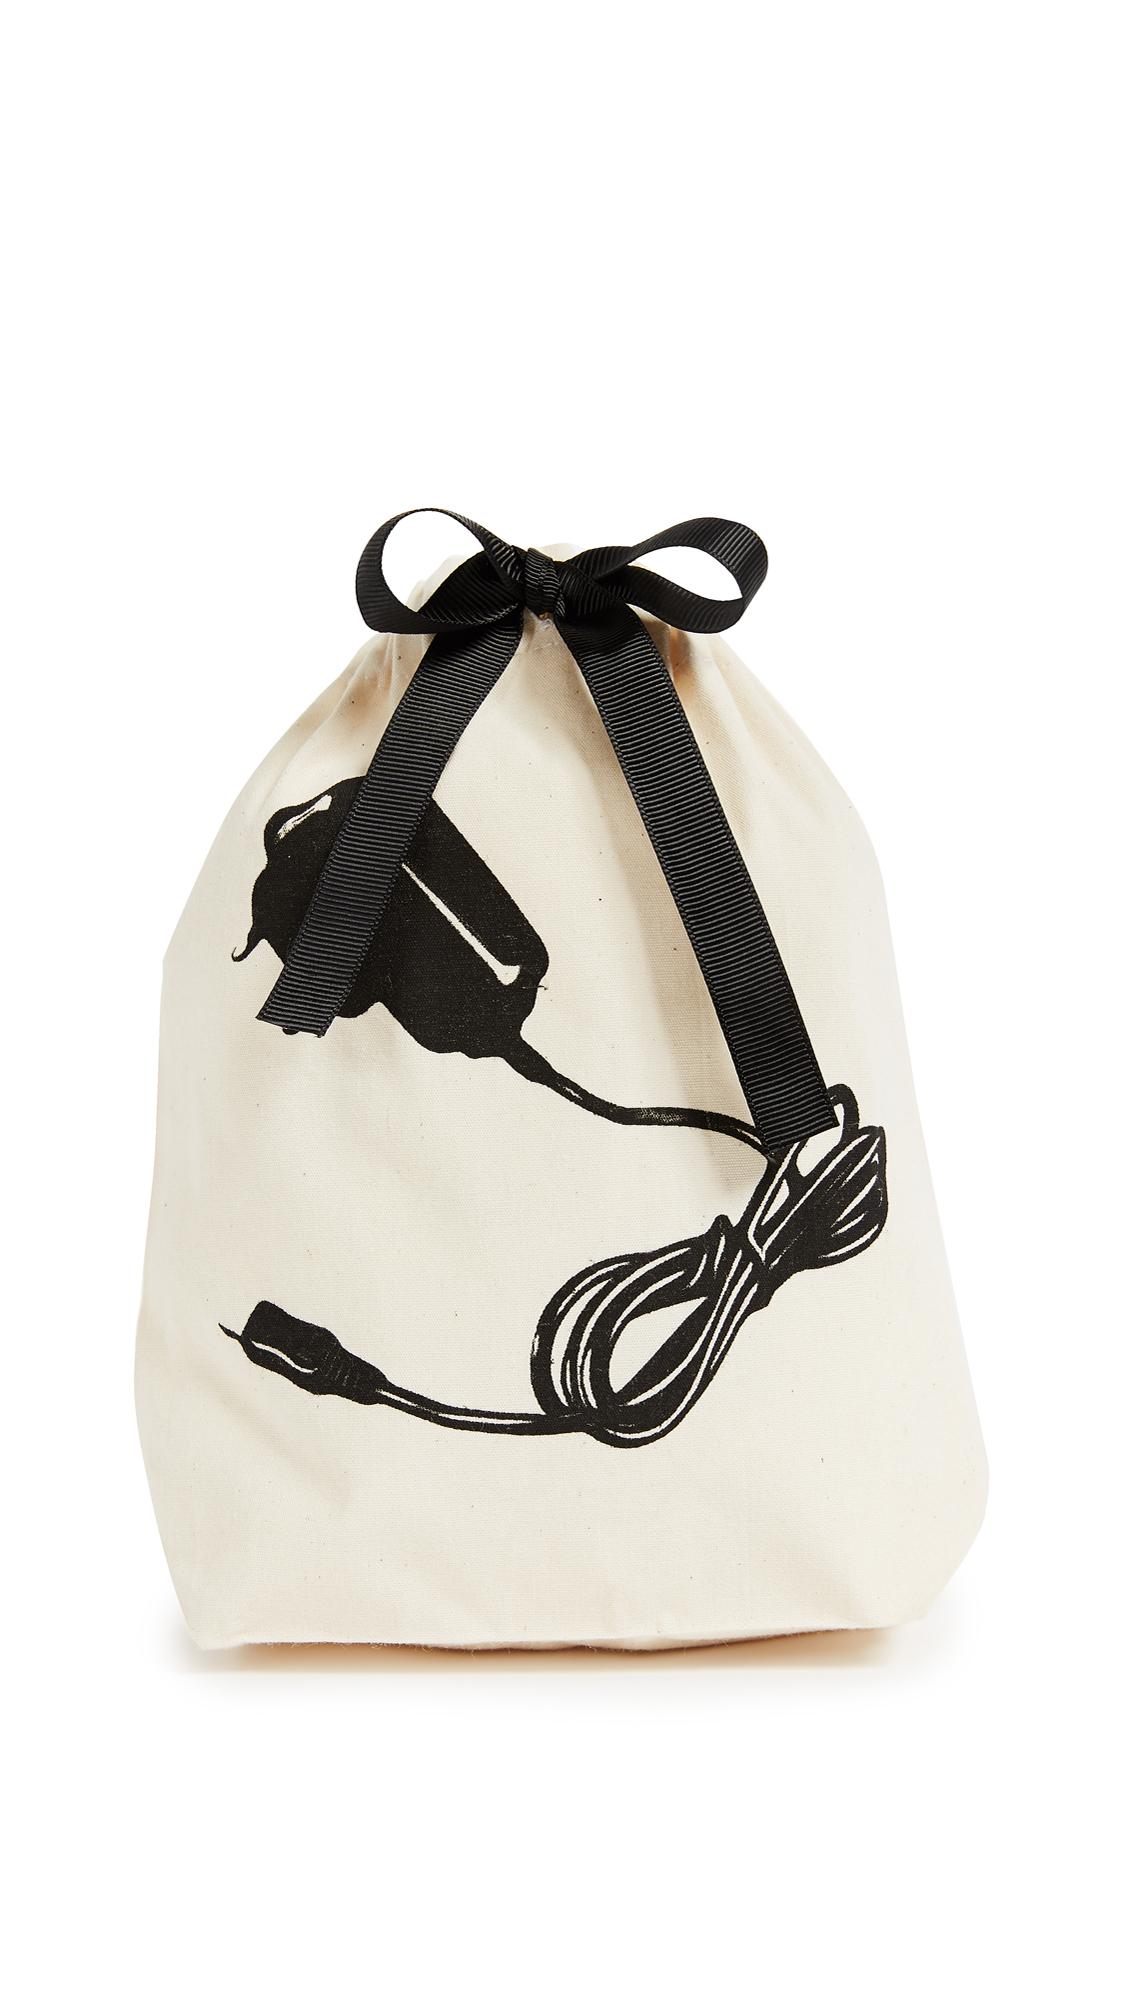 Bag-all Charger Small Organizing Bag - Natural/Black